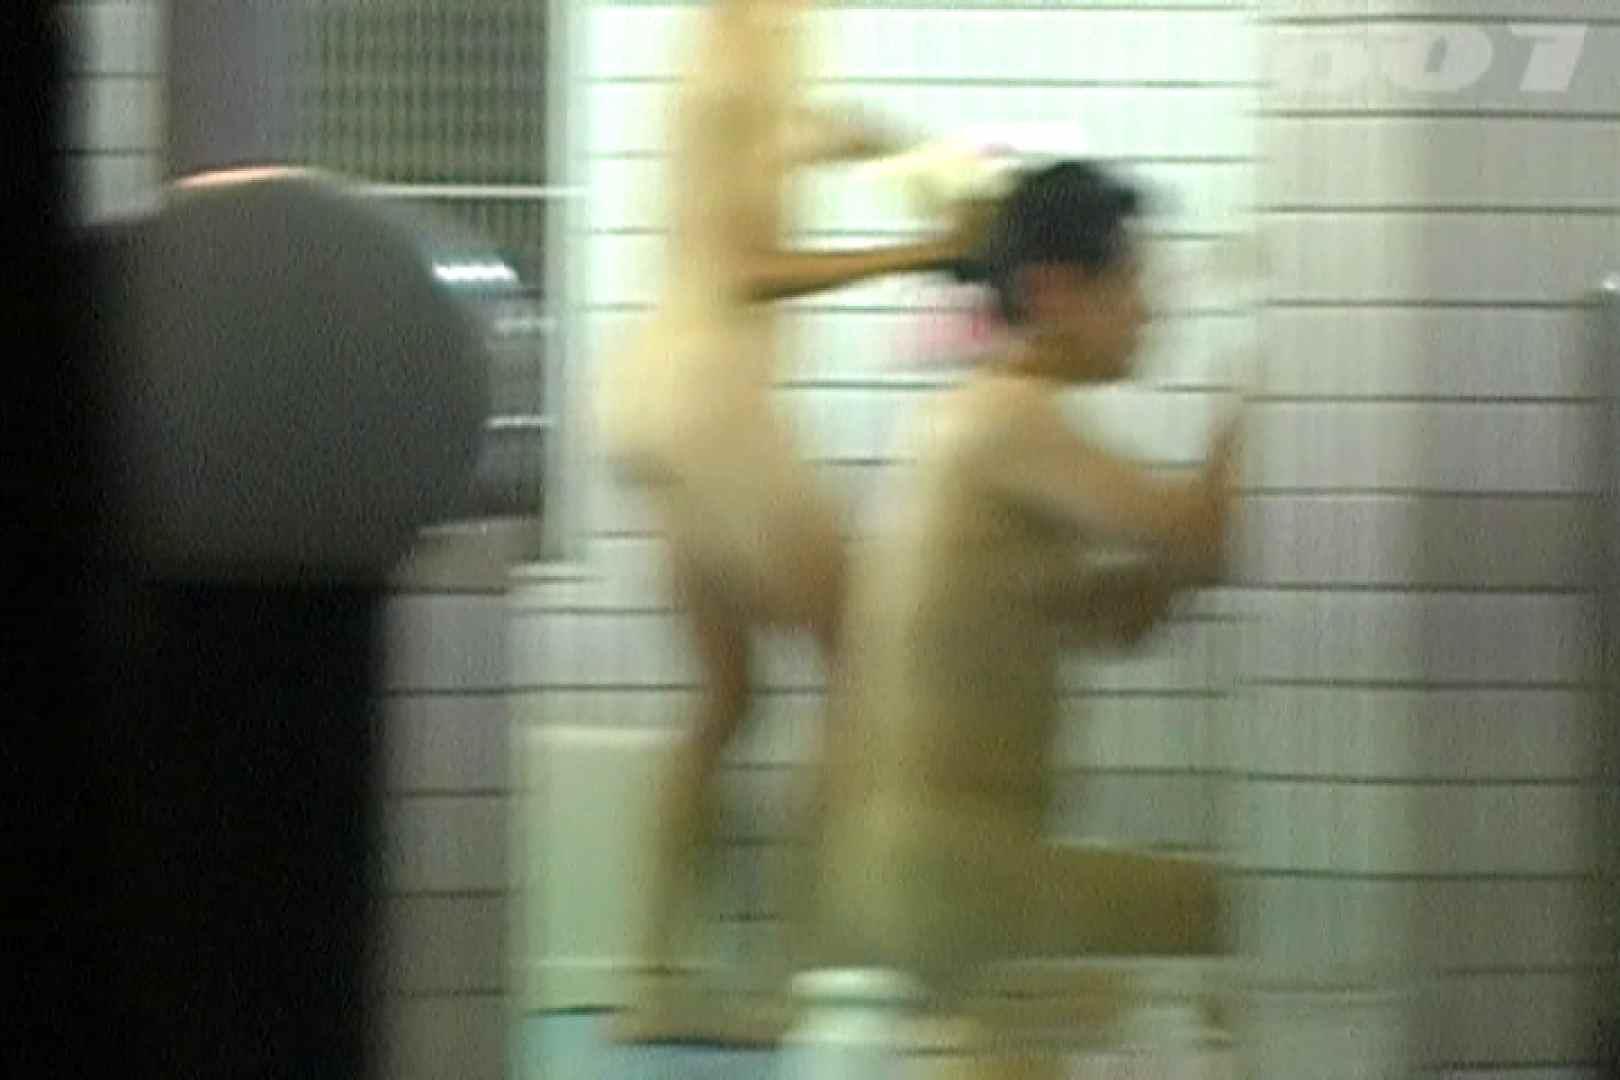 ▲復活限定▲合宿ホテル女風呂盗撮 Vol.07 0 | 0  92画像 30